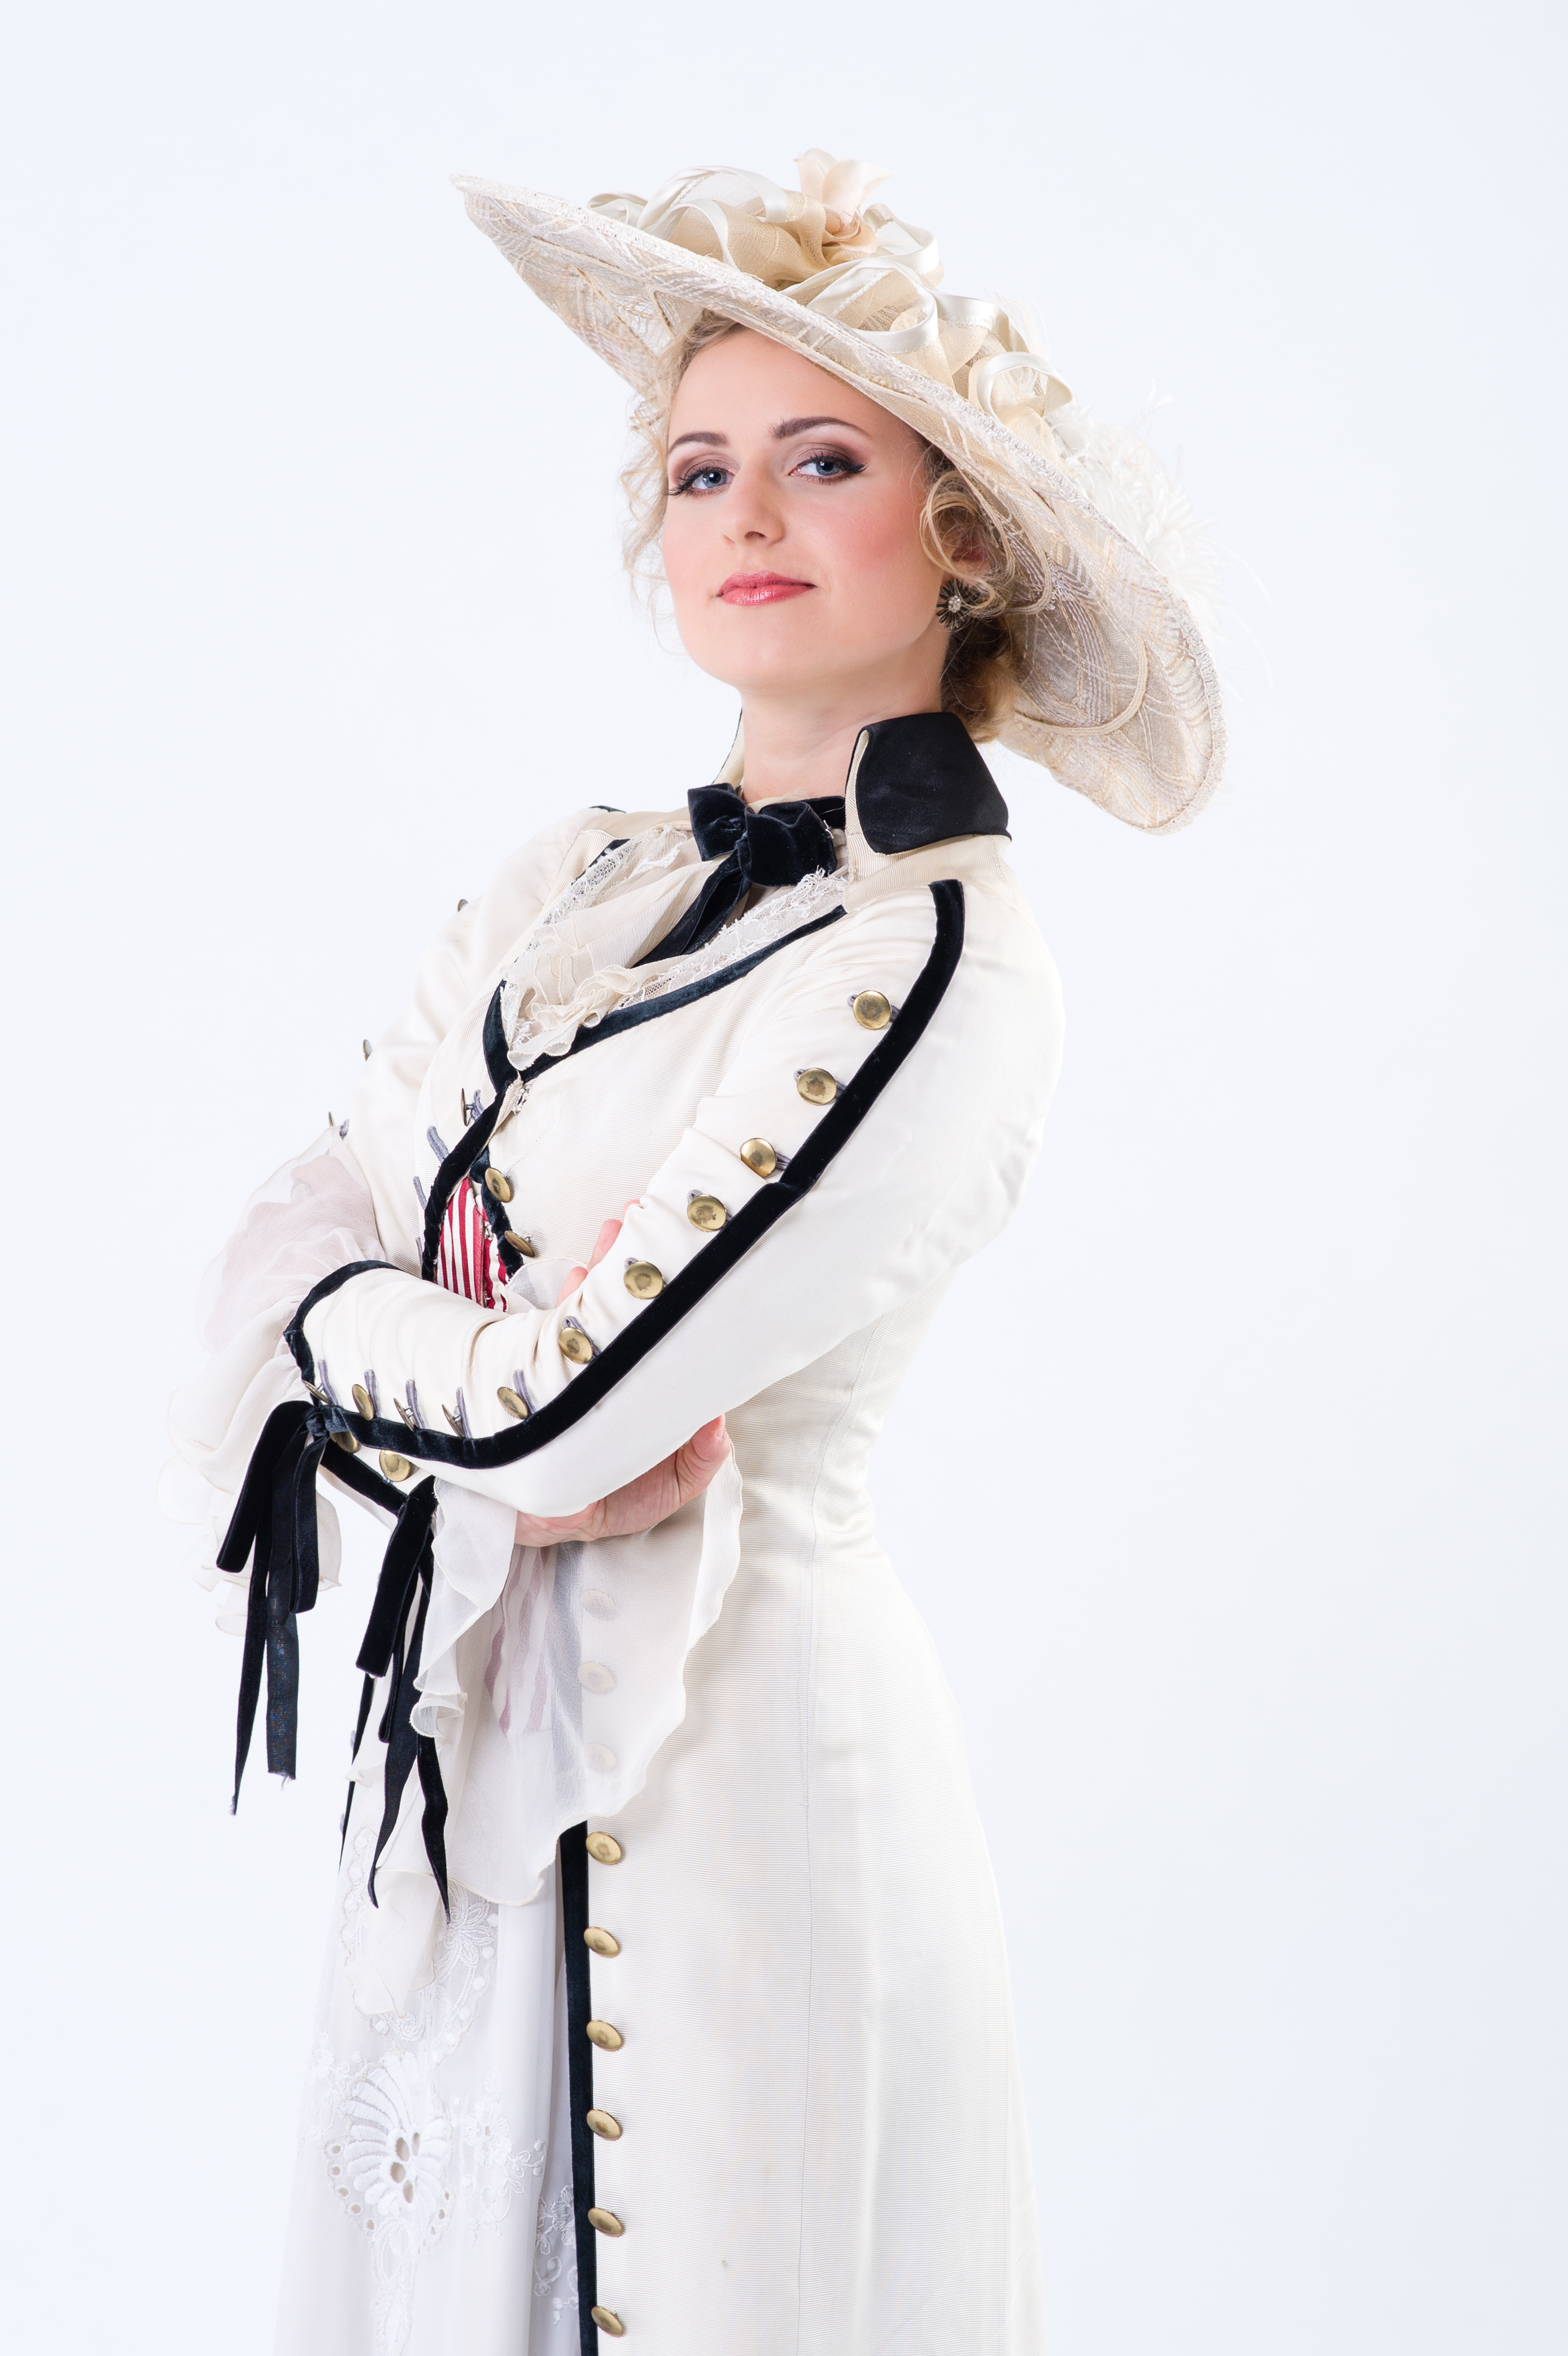 My Fair Lady 2016 - (c) Andreas Wenter, www.permanentmoments